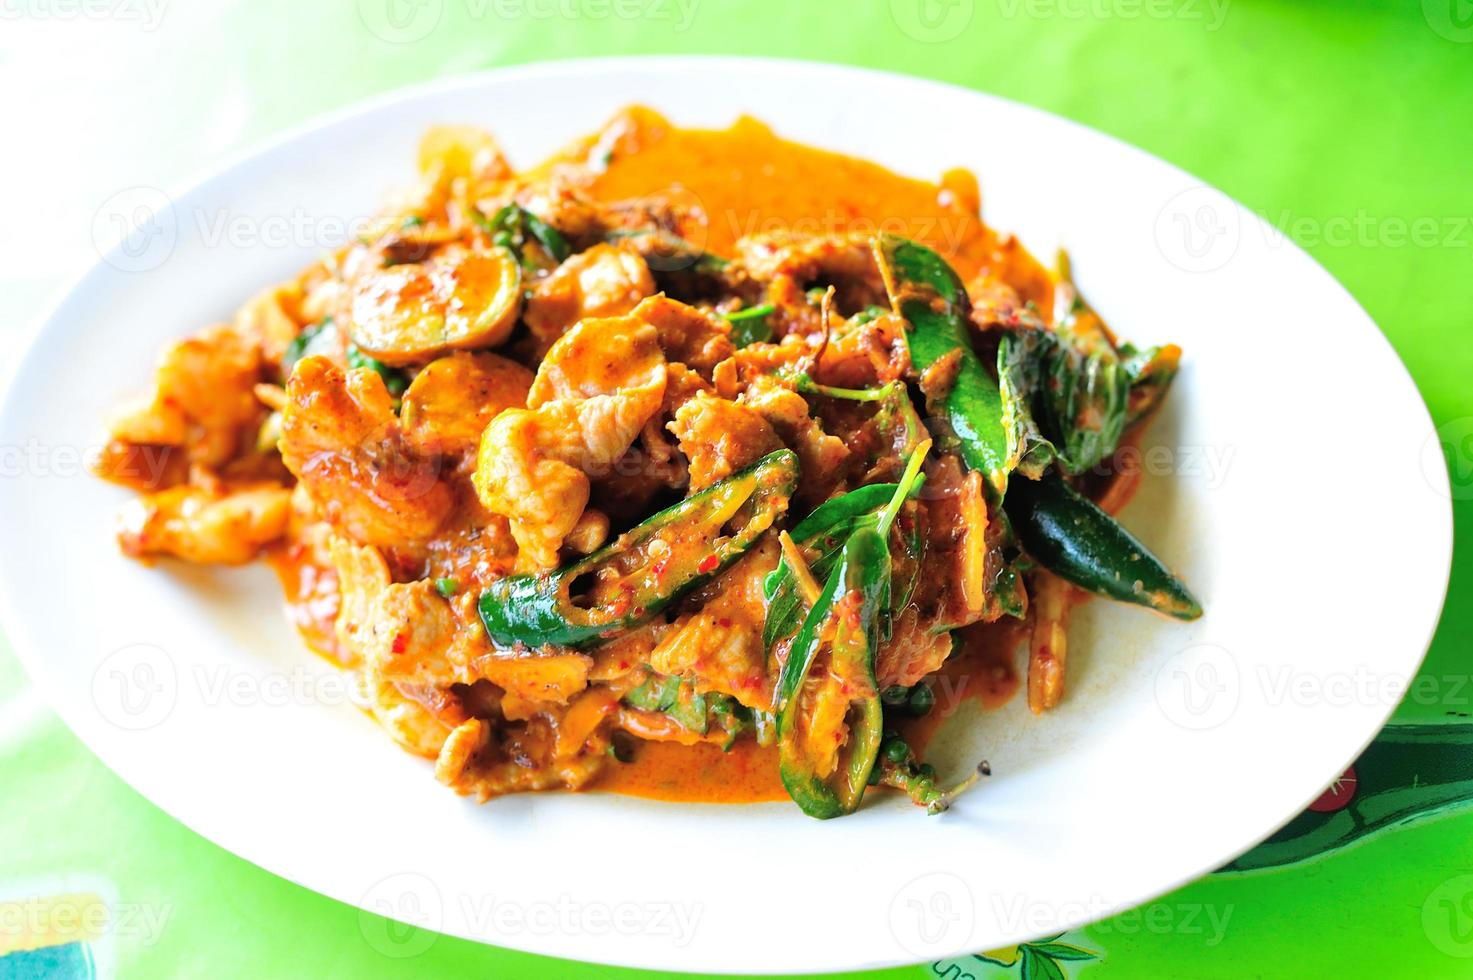 kryddig omrörd stekt fläsk med röd curry foto